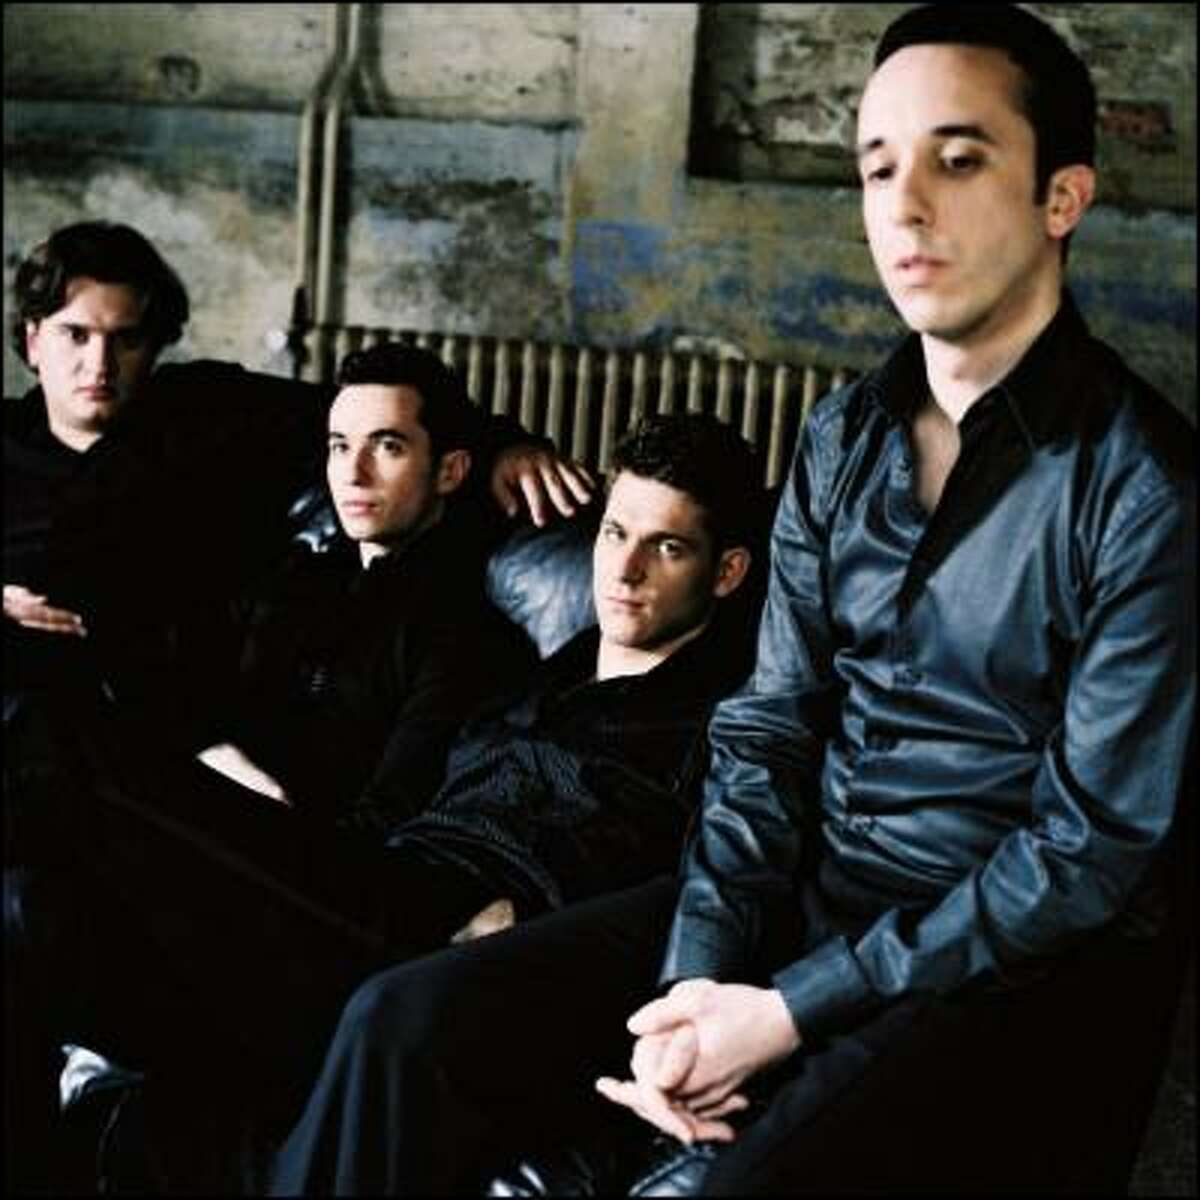 The Ebene Quartet has built a reputation, adding jazz and pop standards to their classical repertoire.